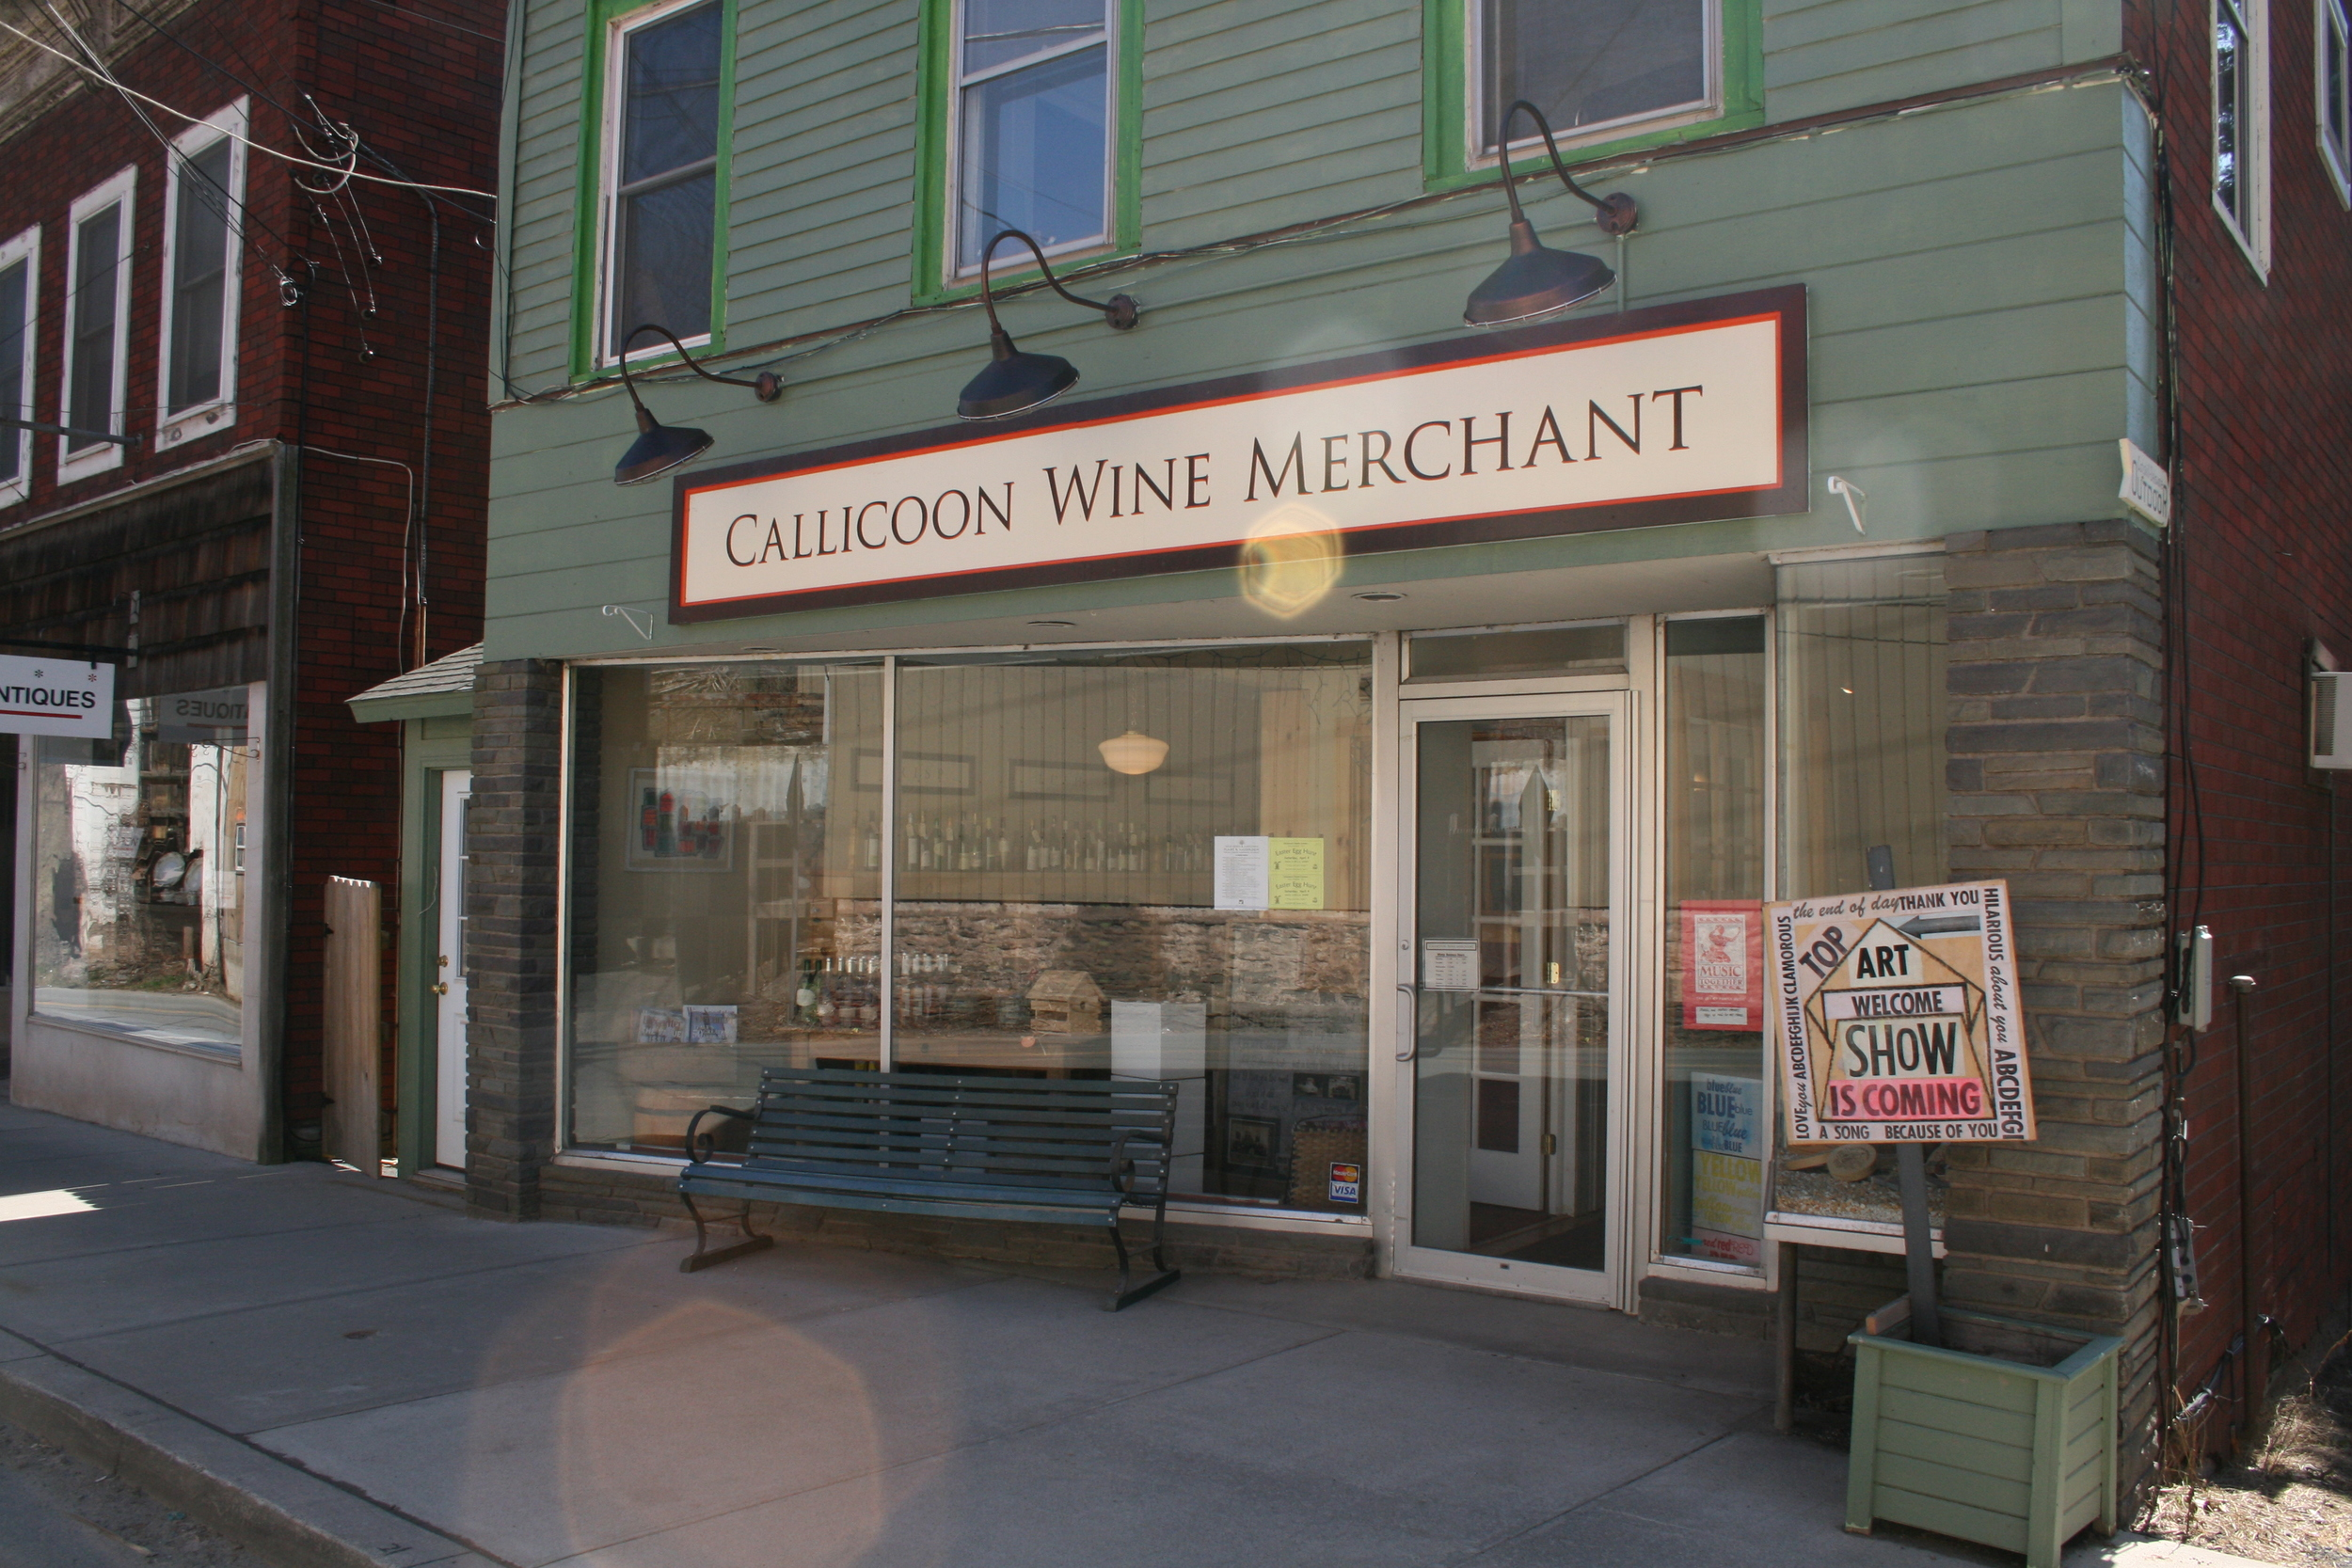 Callicoon Wine Merchant